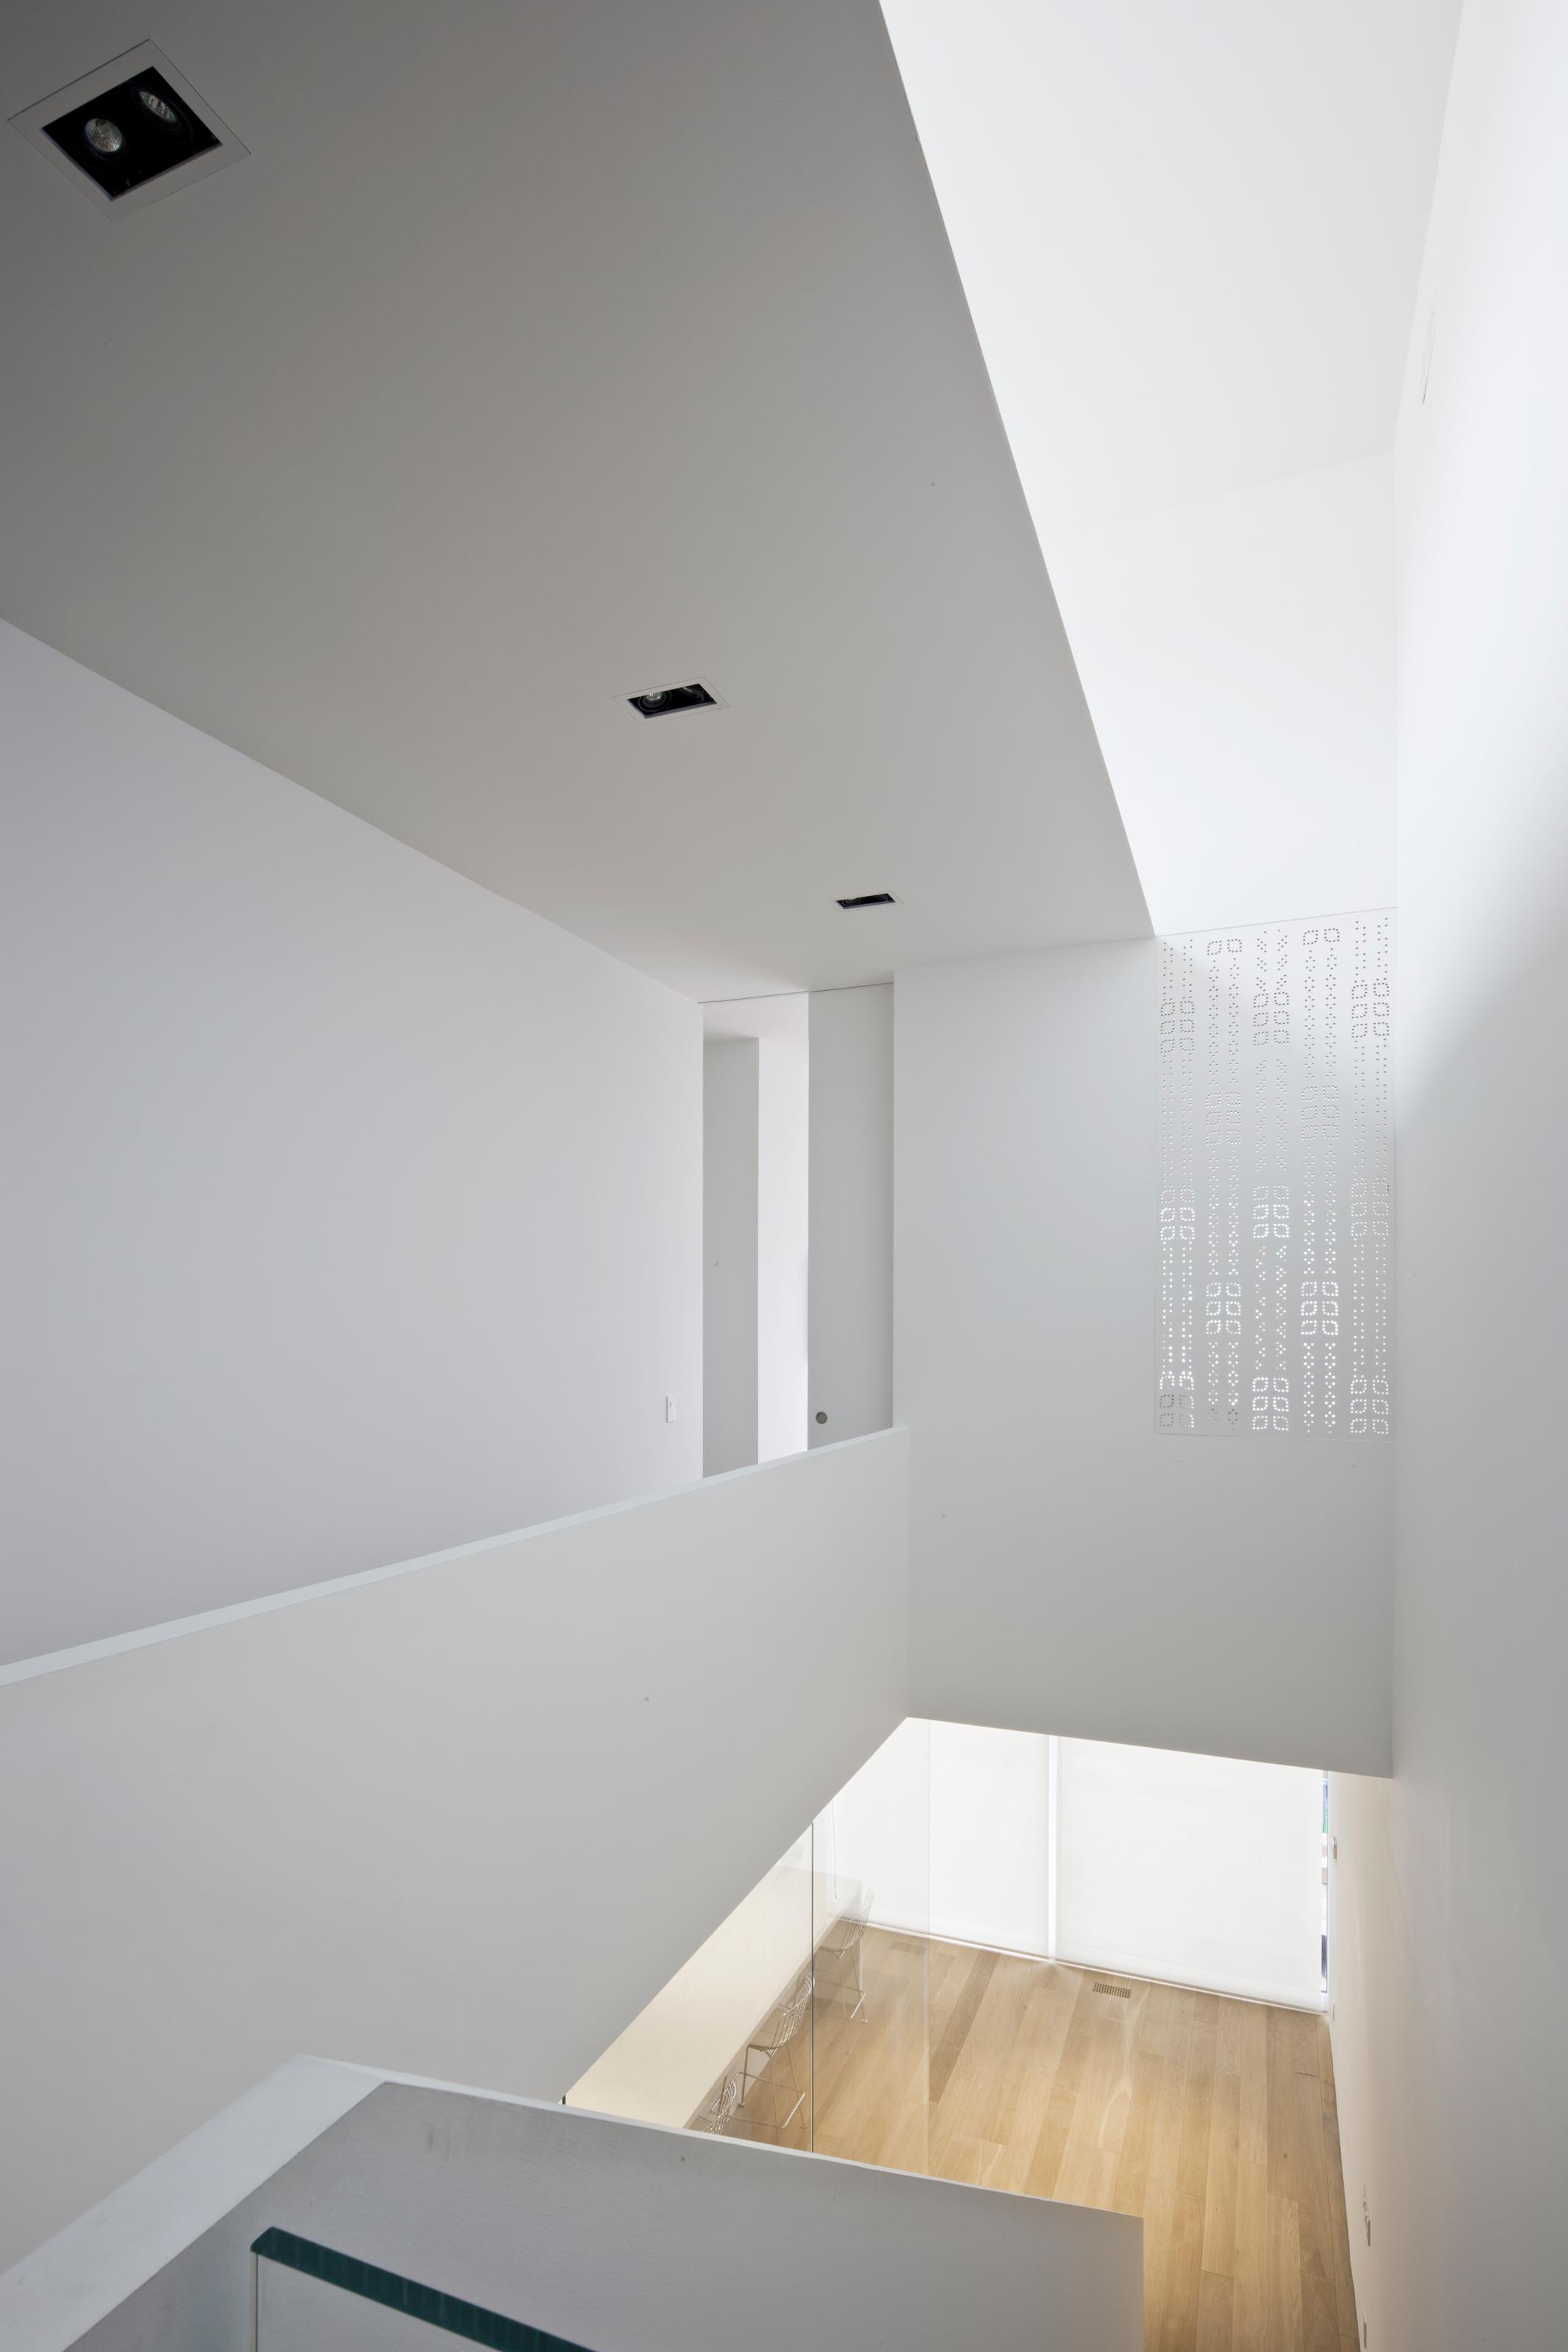 Robert House - stair skylight